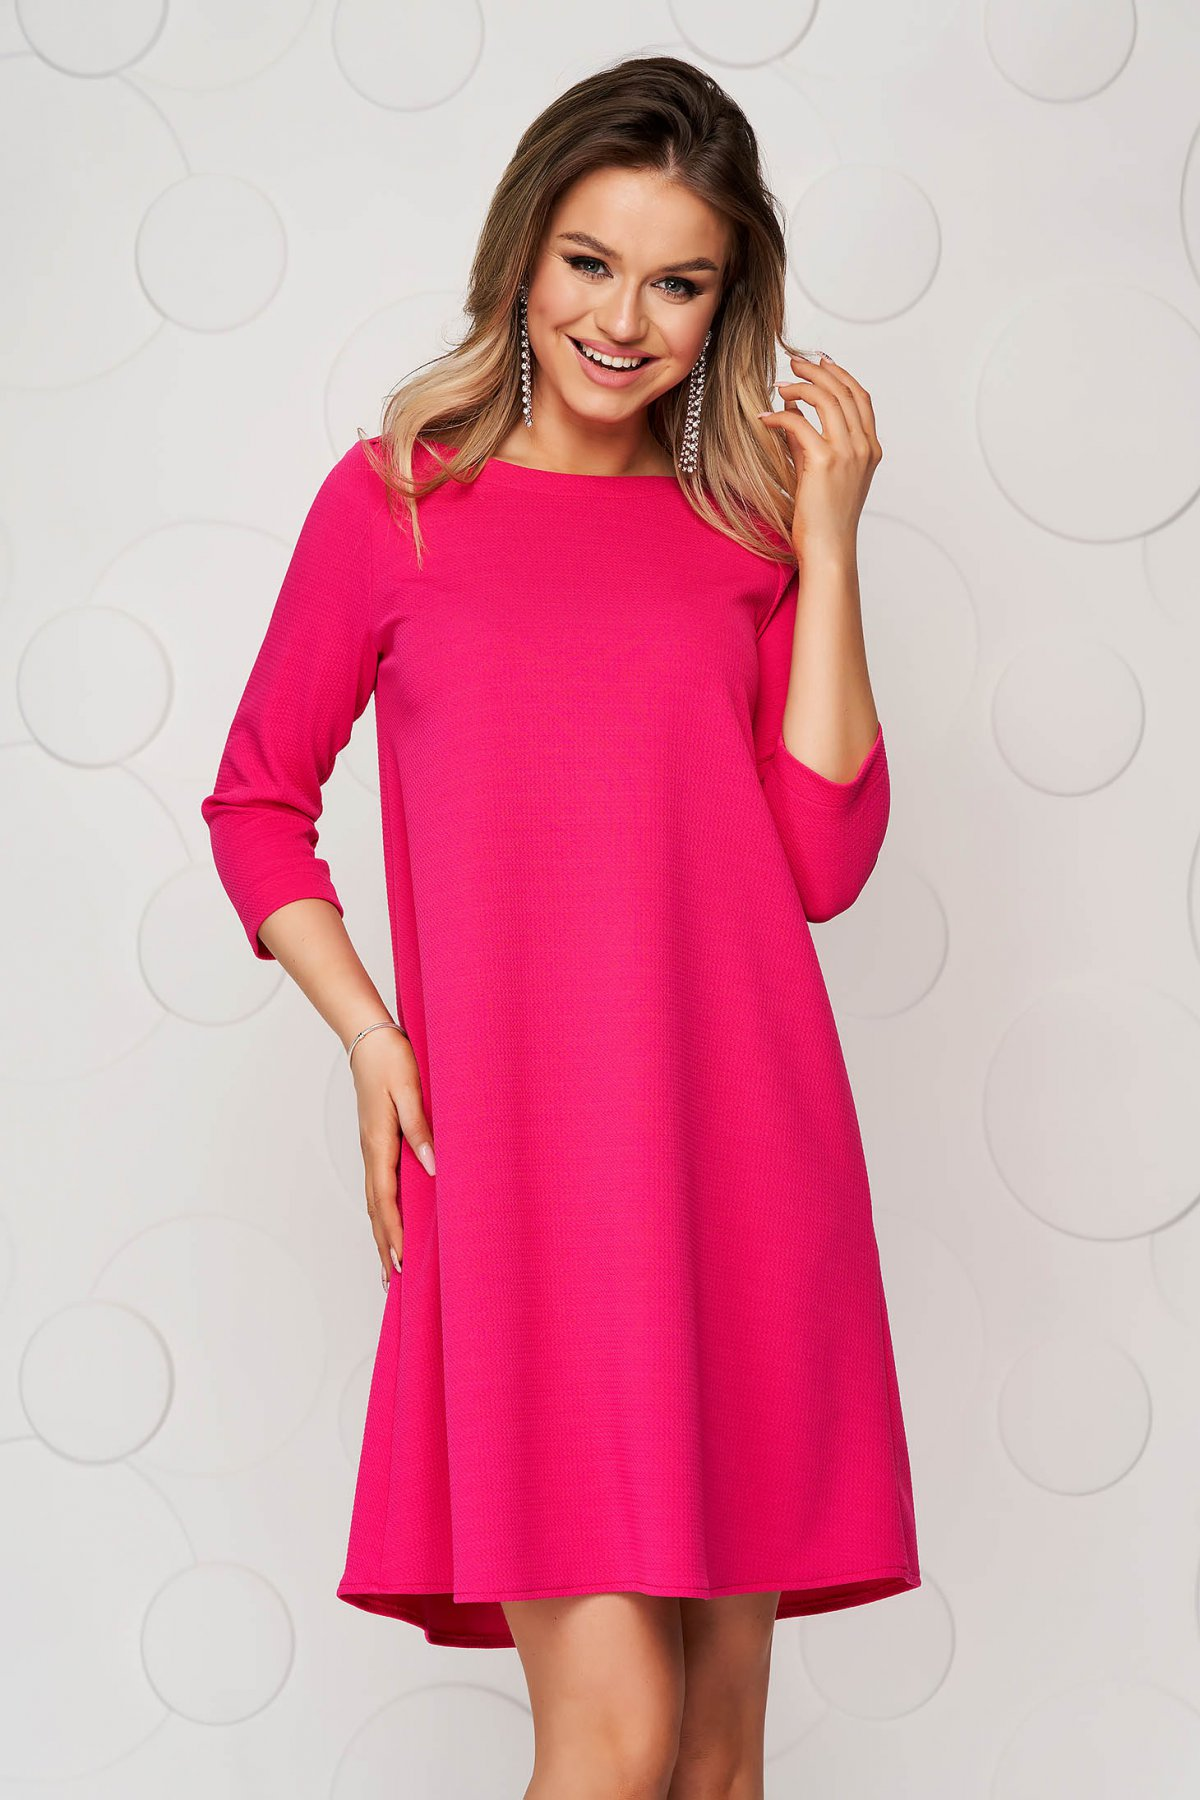 Rochie StarShinerS roz scurta de zi din material elastic cu croi larg - medelin.ro